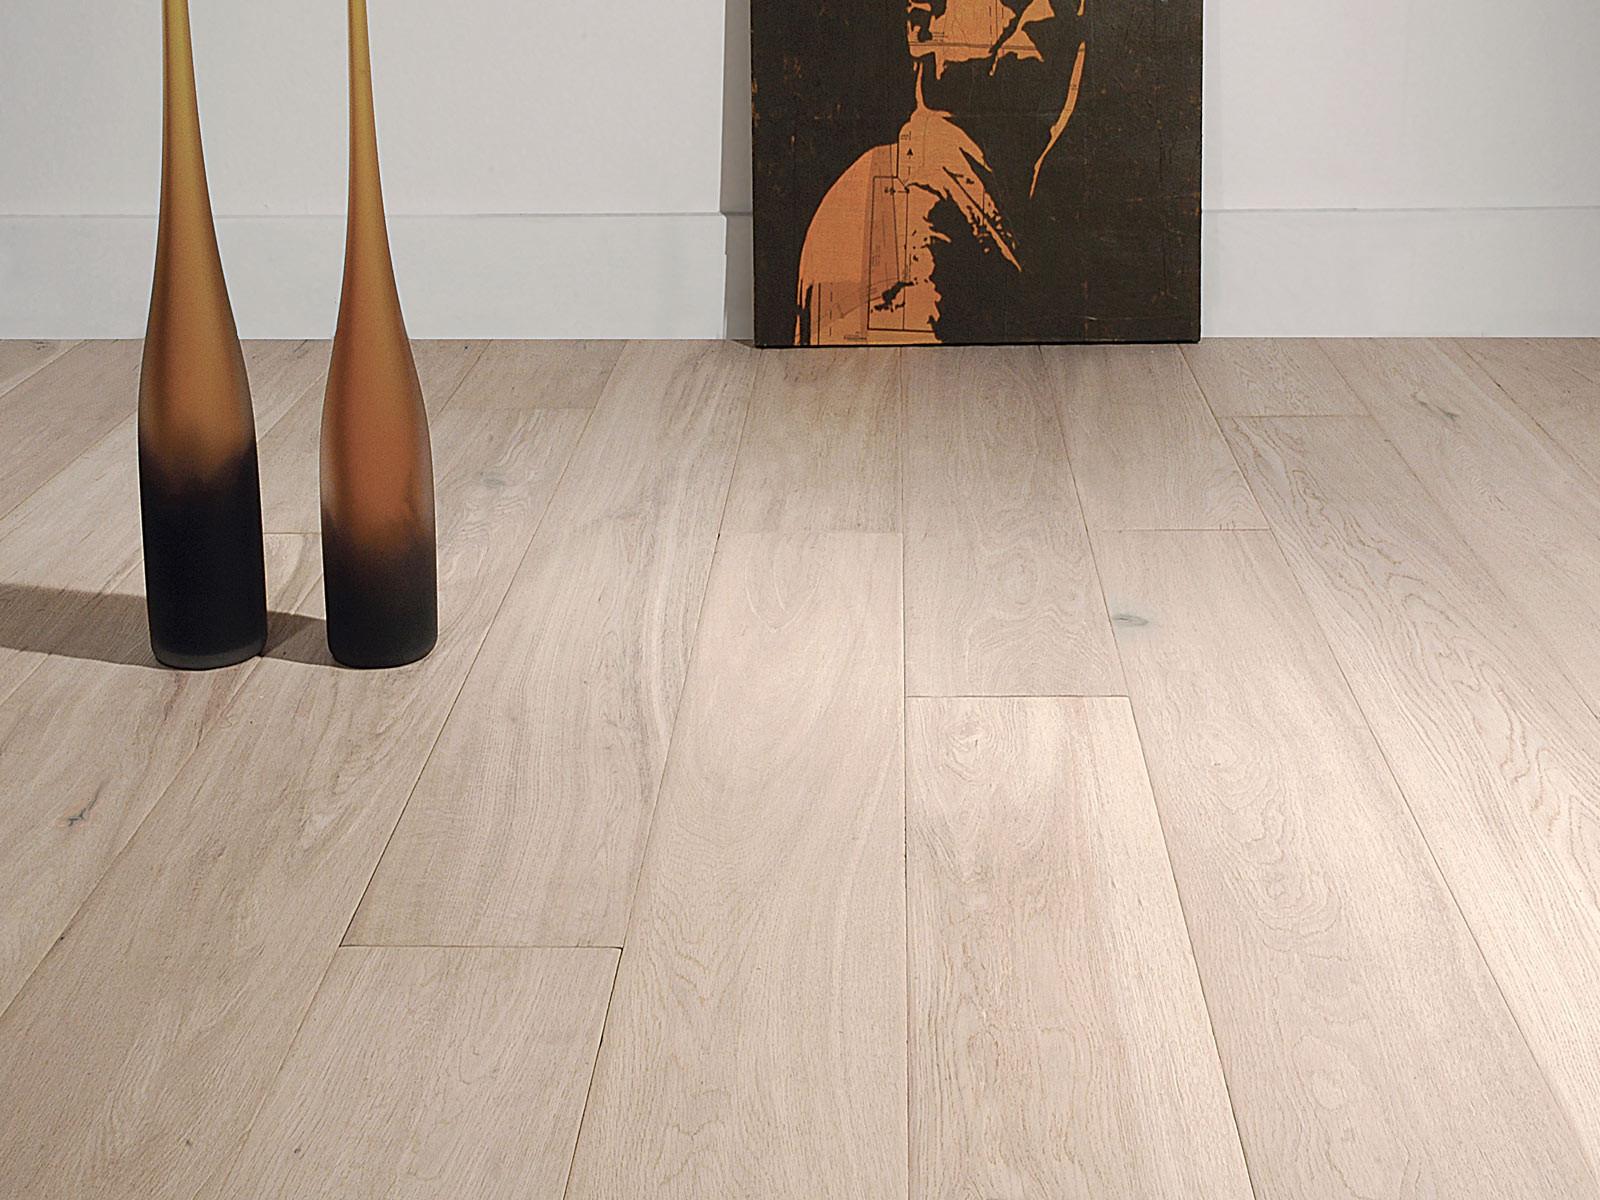 engineered hardwood flooring vs hardwood of duchateau hardwood flooring houston tx discount engineered wood throughout white oiled